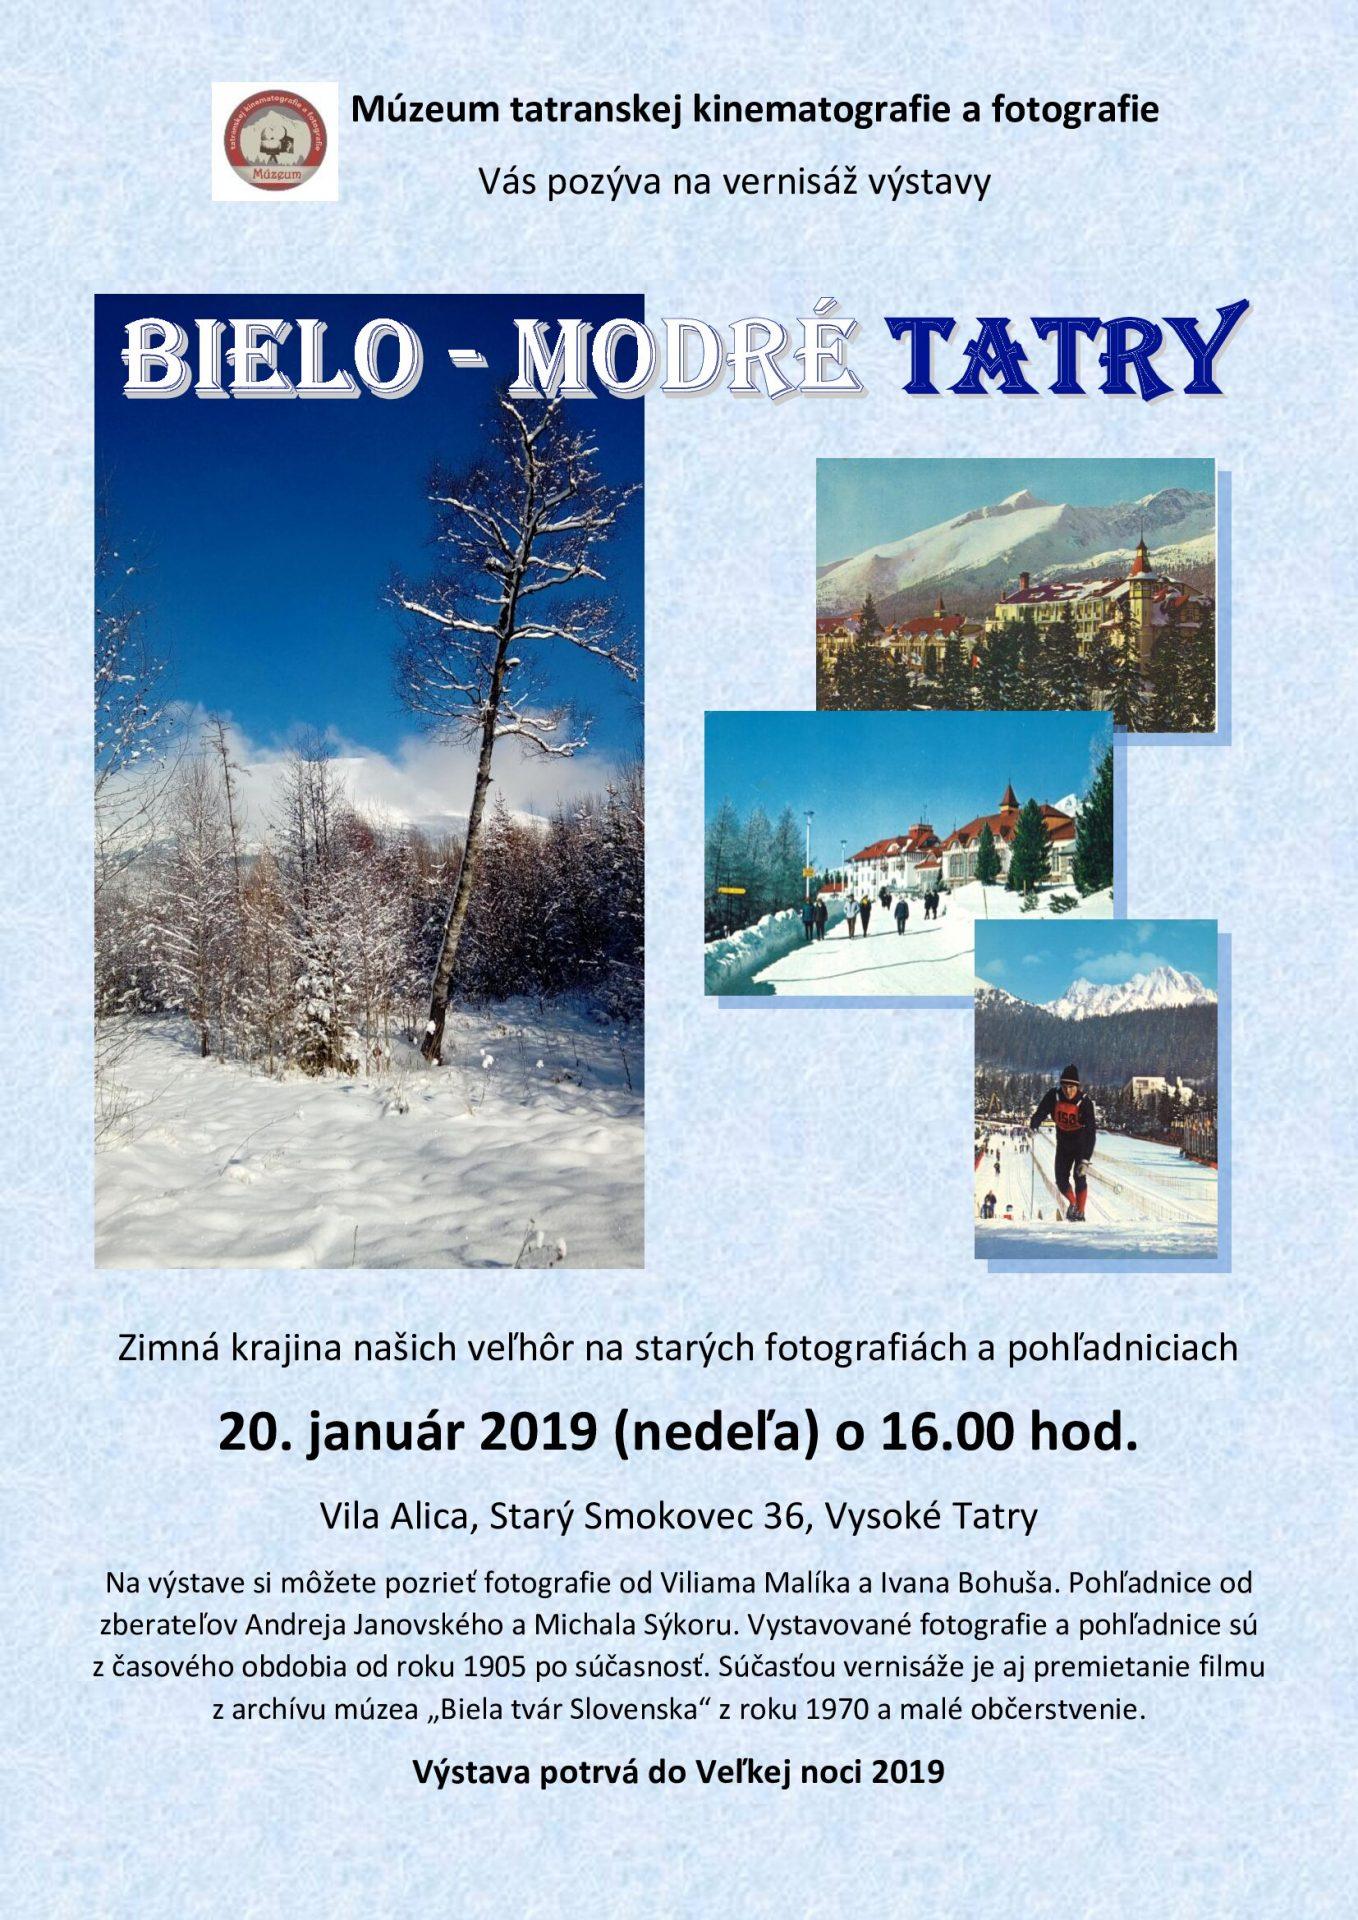 Bielo-modré Tatry